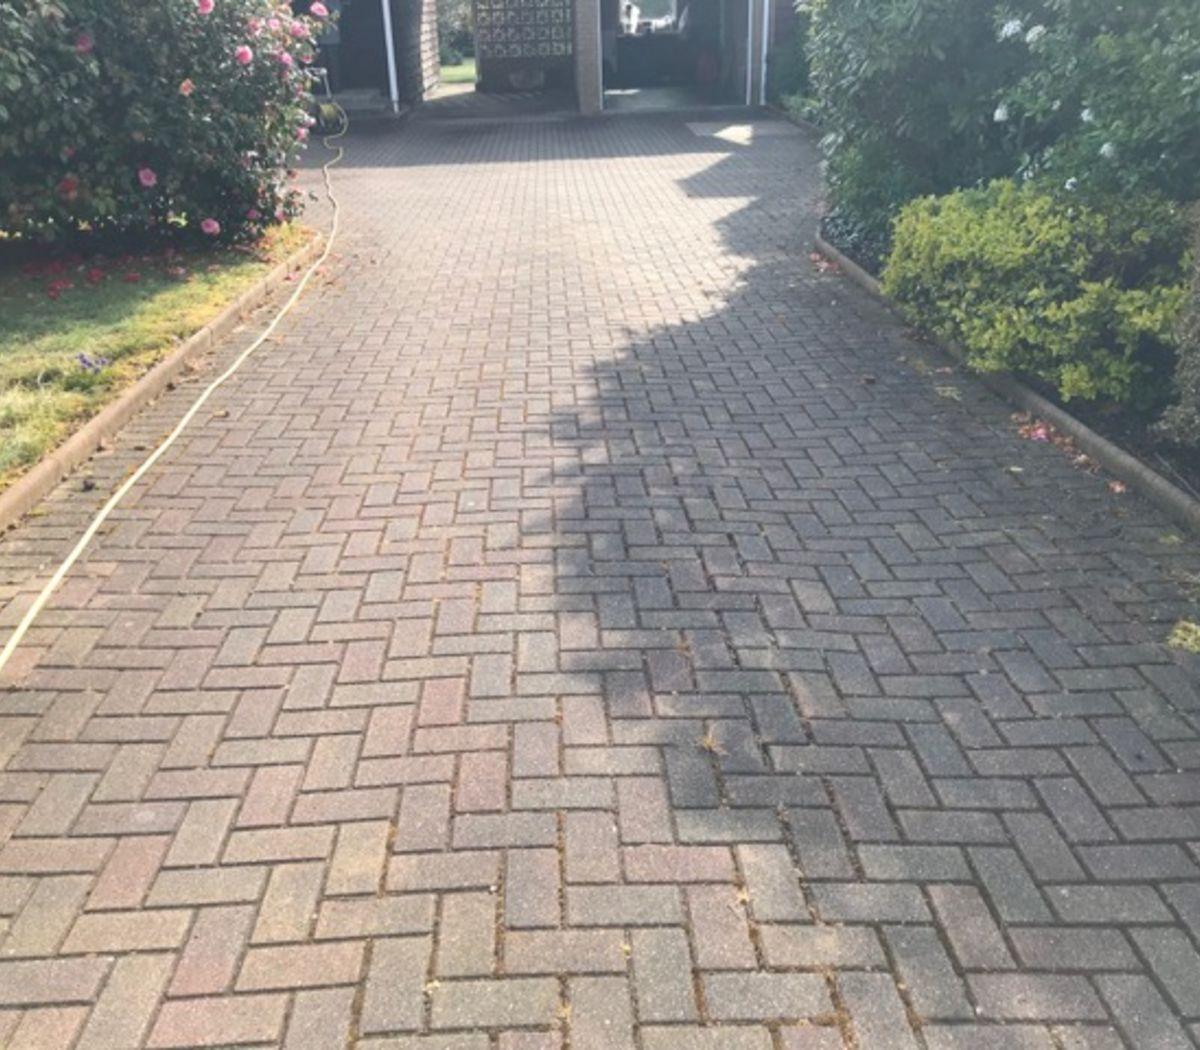 driveway cleaning company llanelli swansea